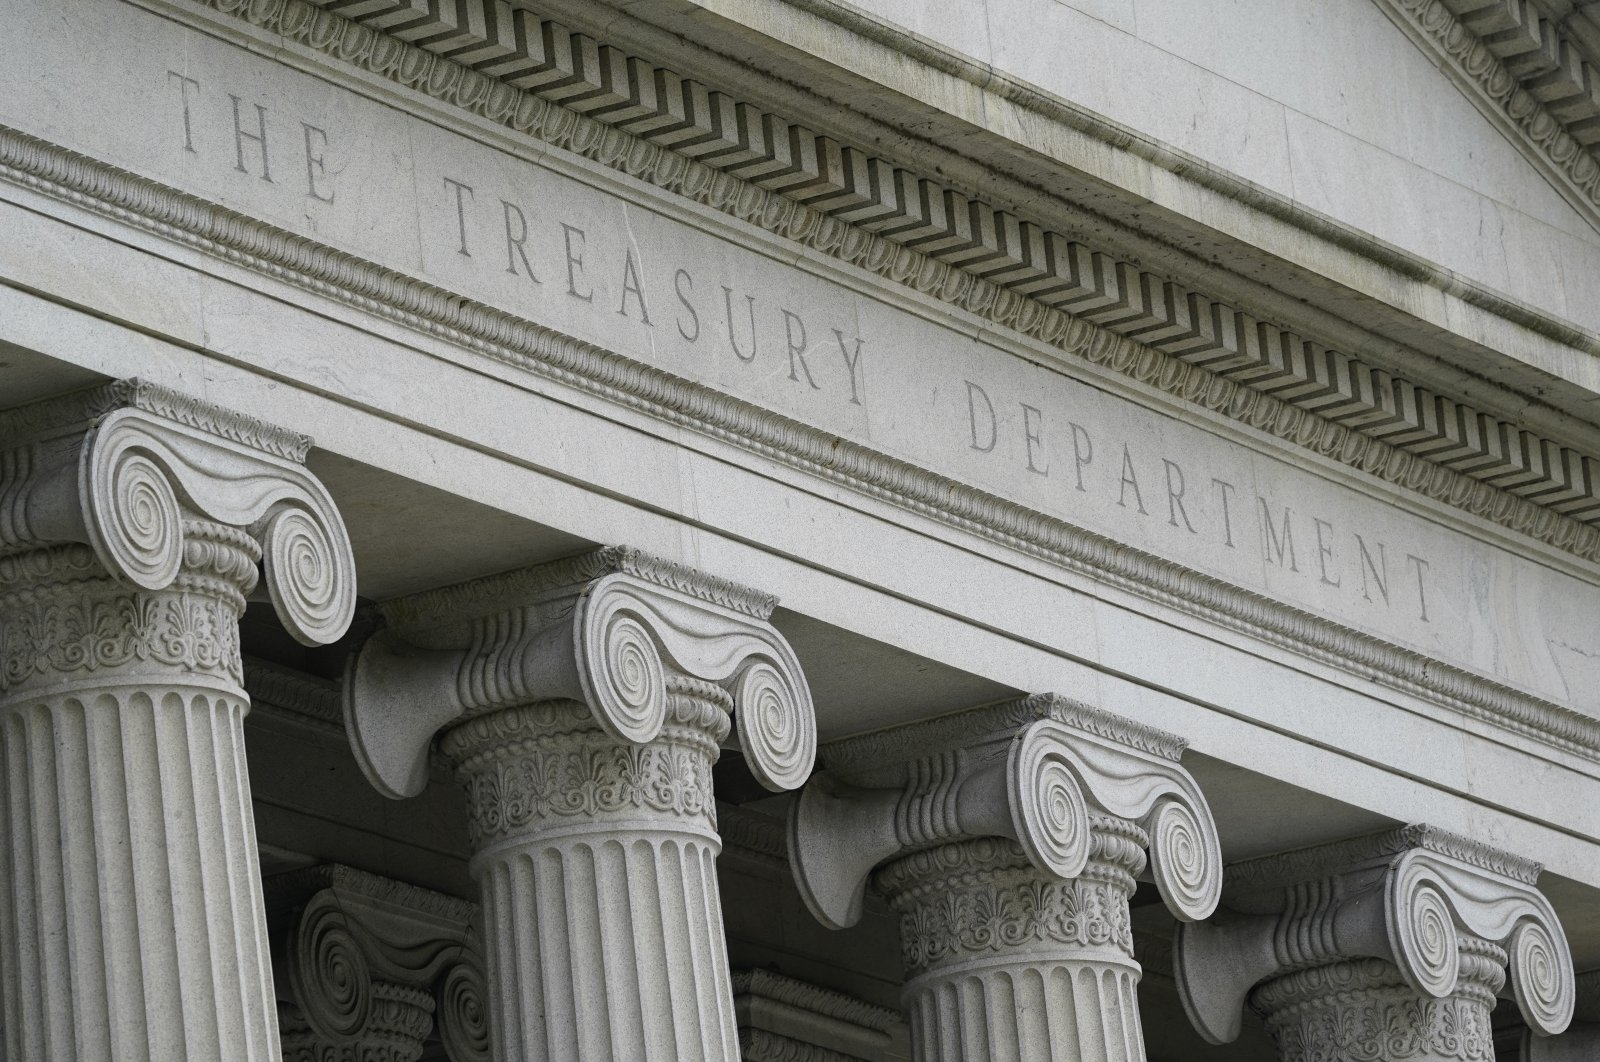 The U.S. Treasury building in Washington, the U.S., May 4, 2021. (AP Photo)